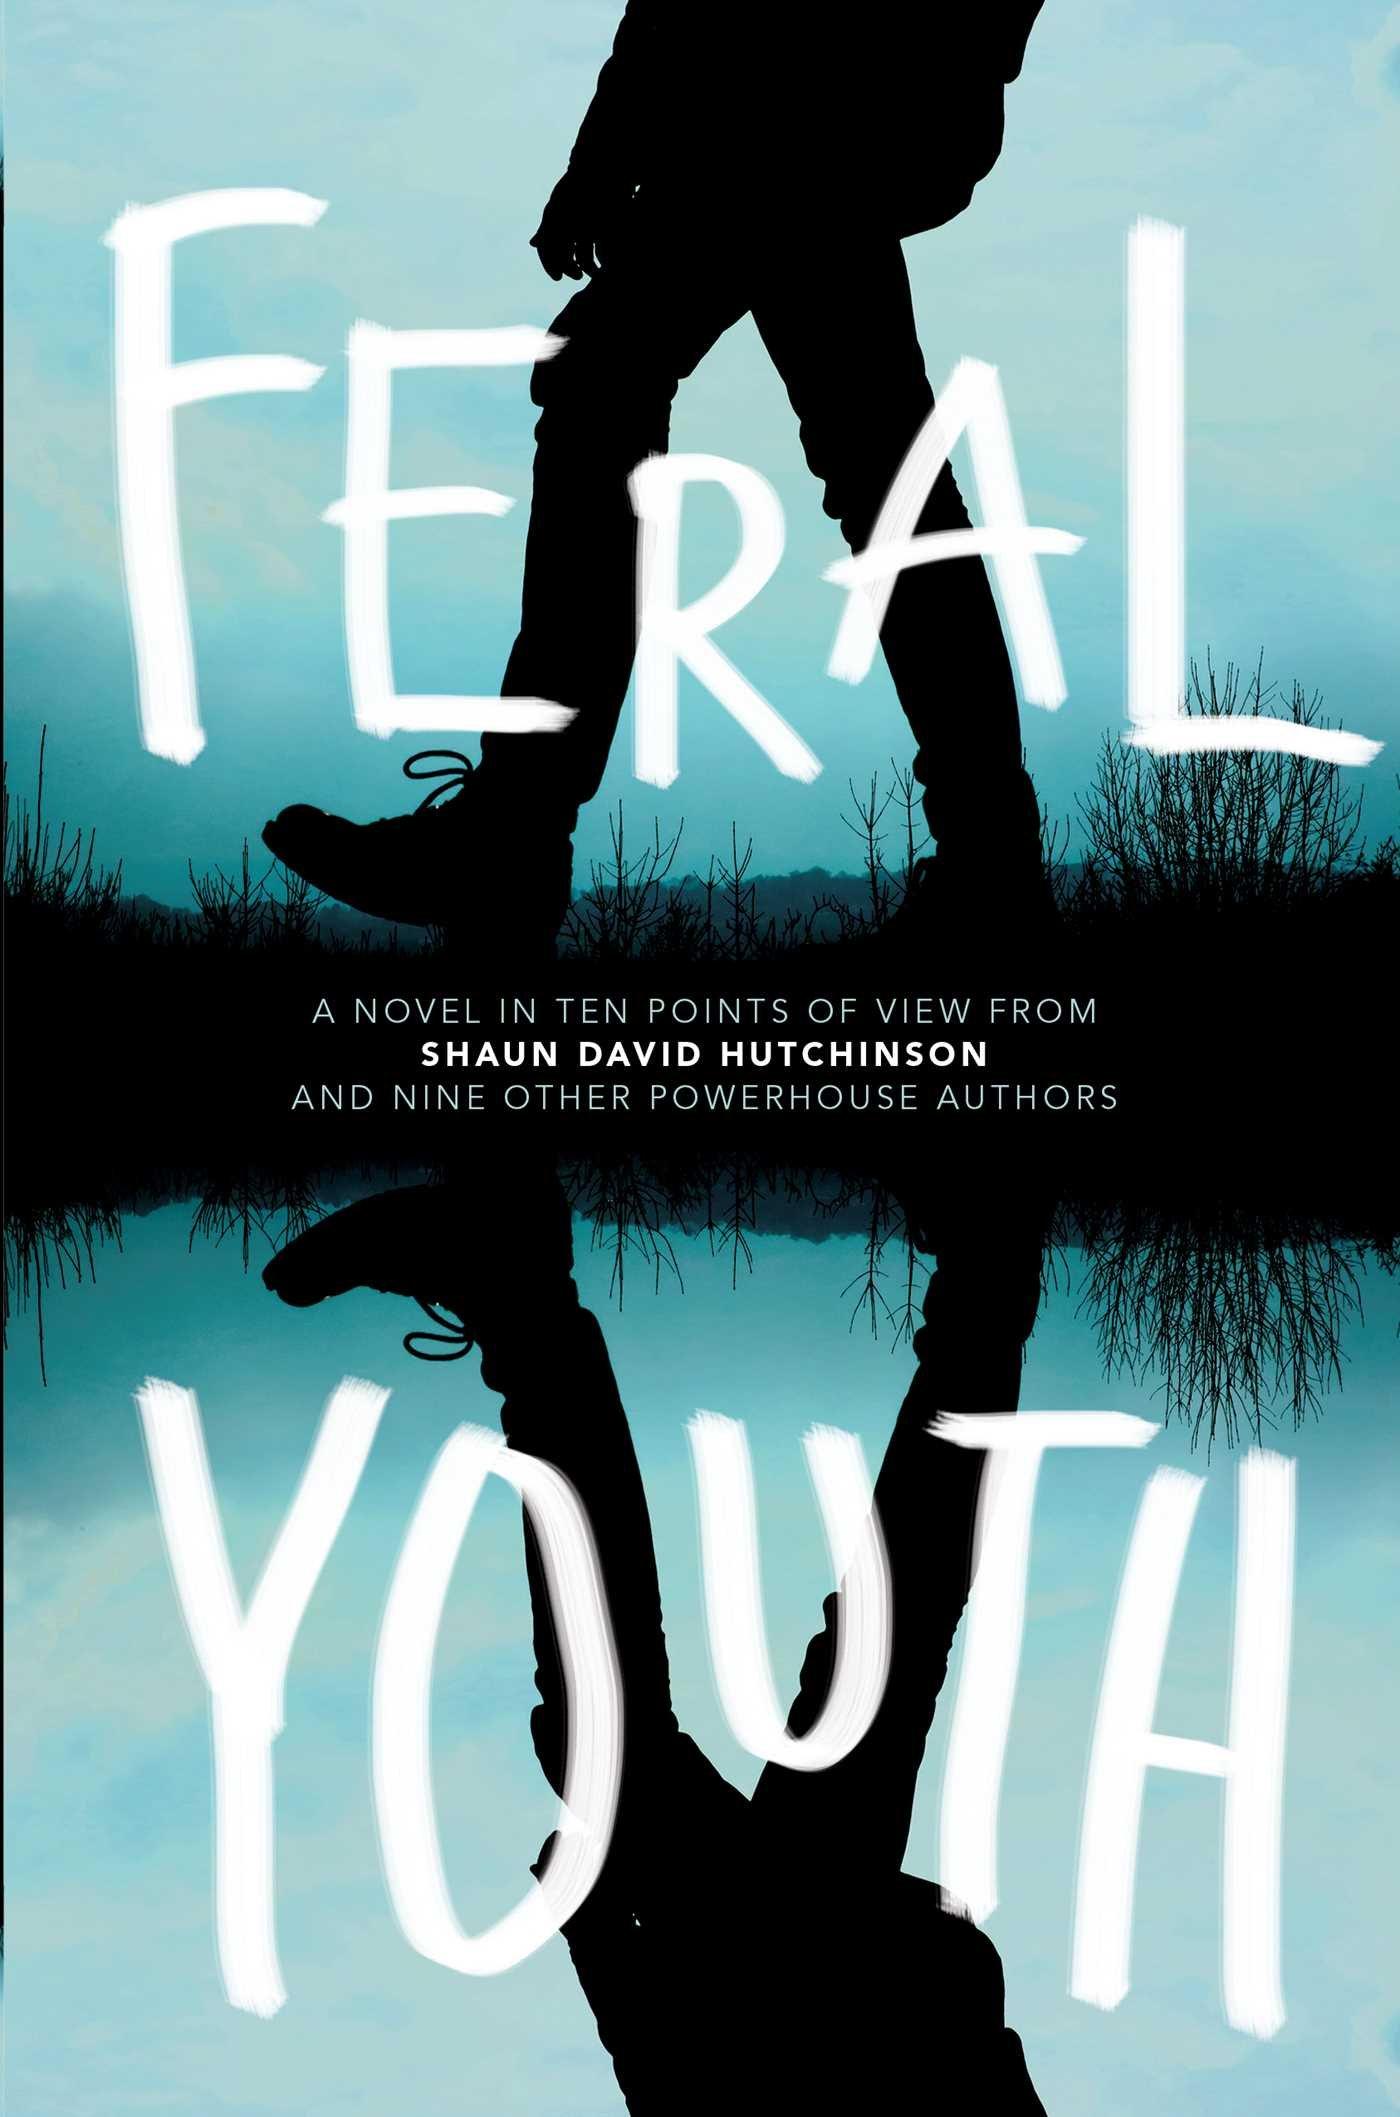 shaun-david-hutchinson-feral-youth.jpg